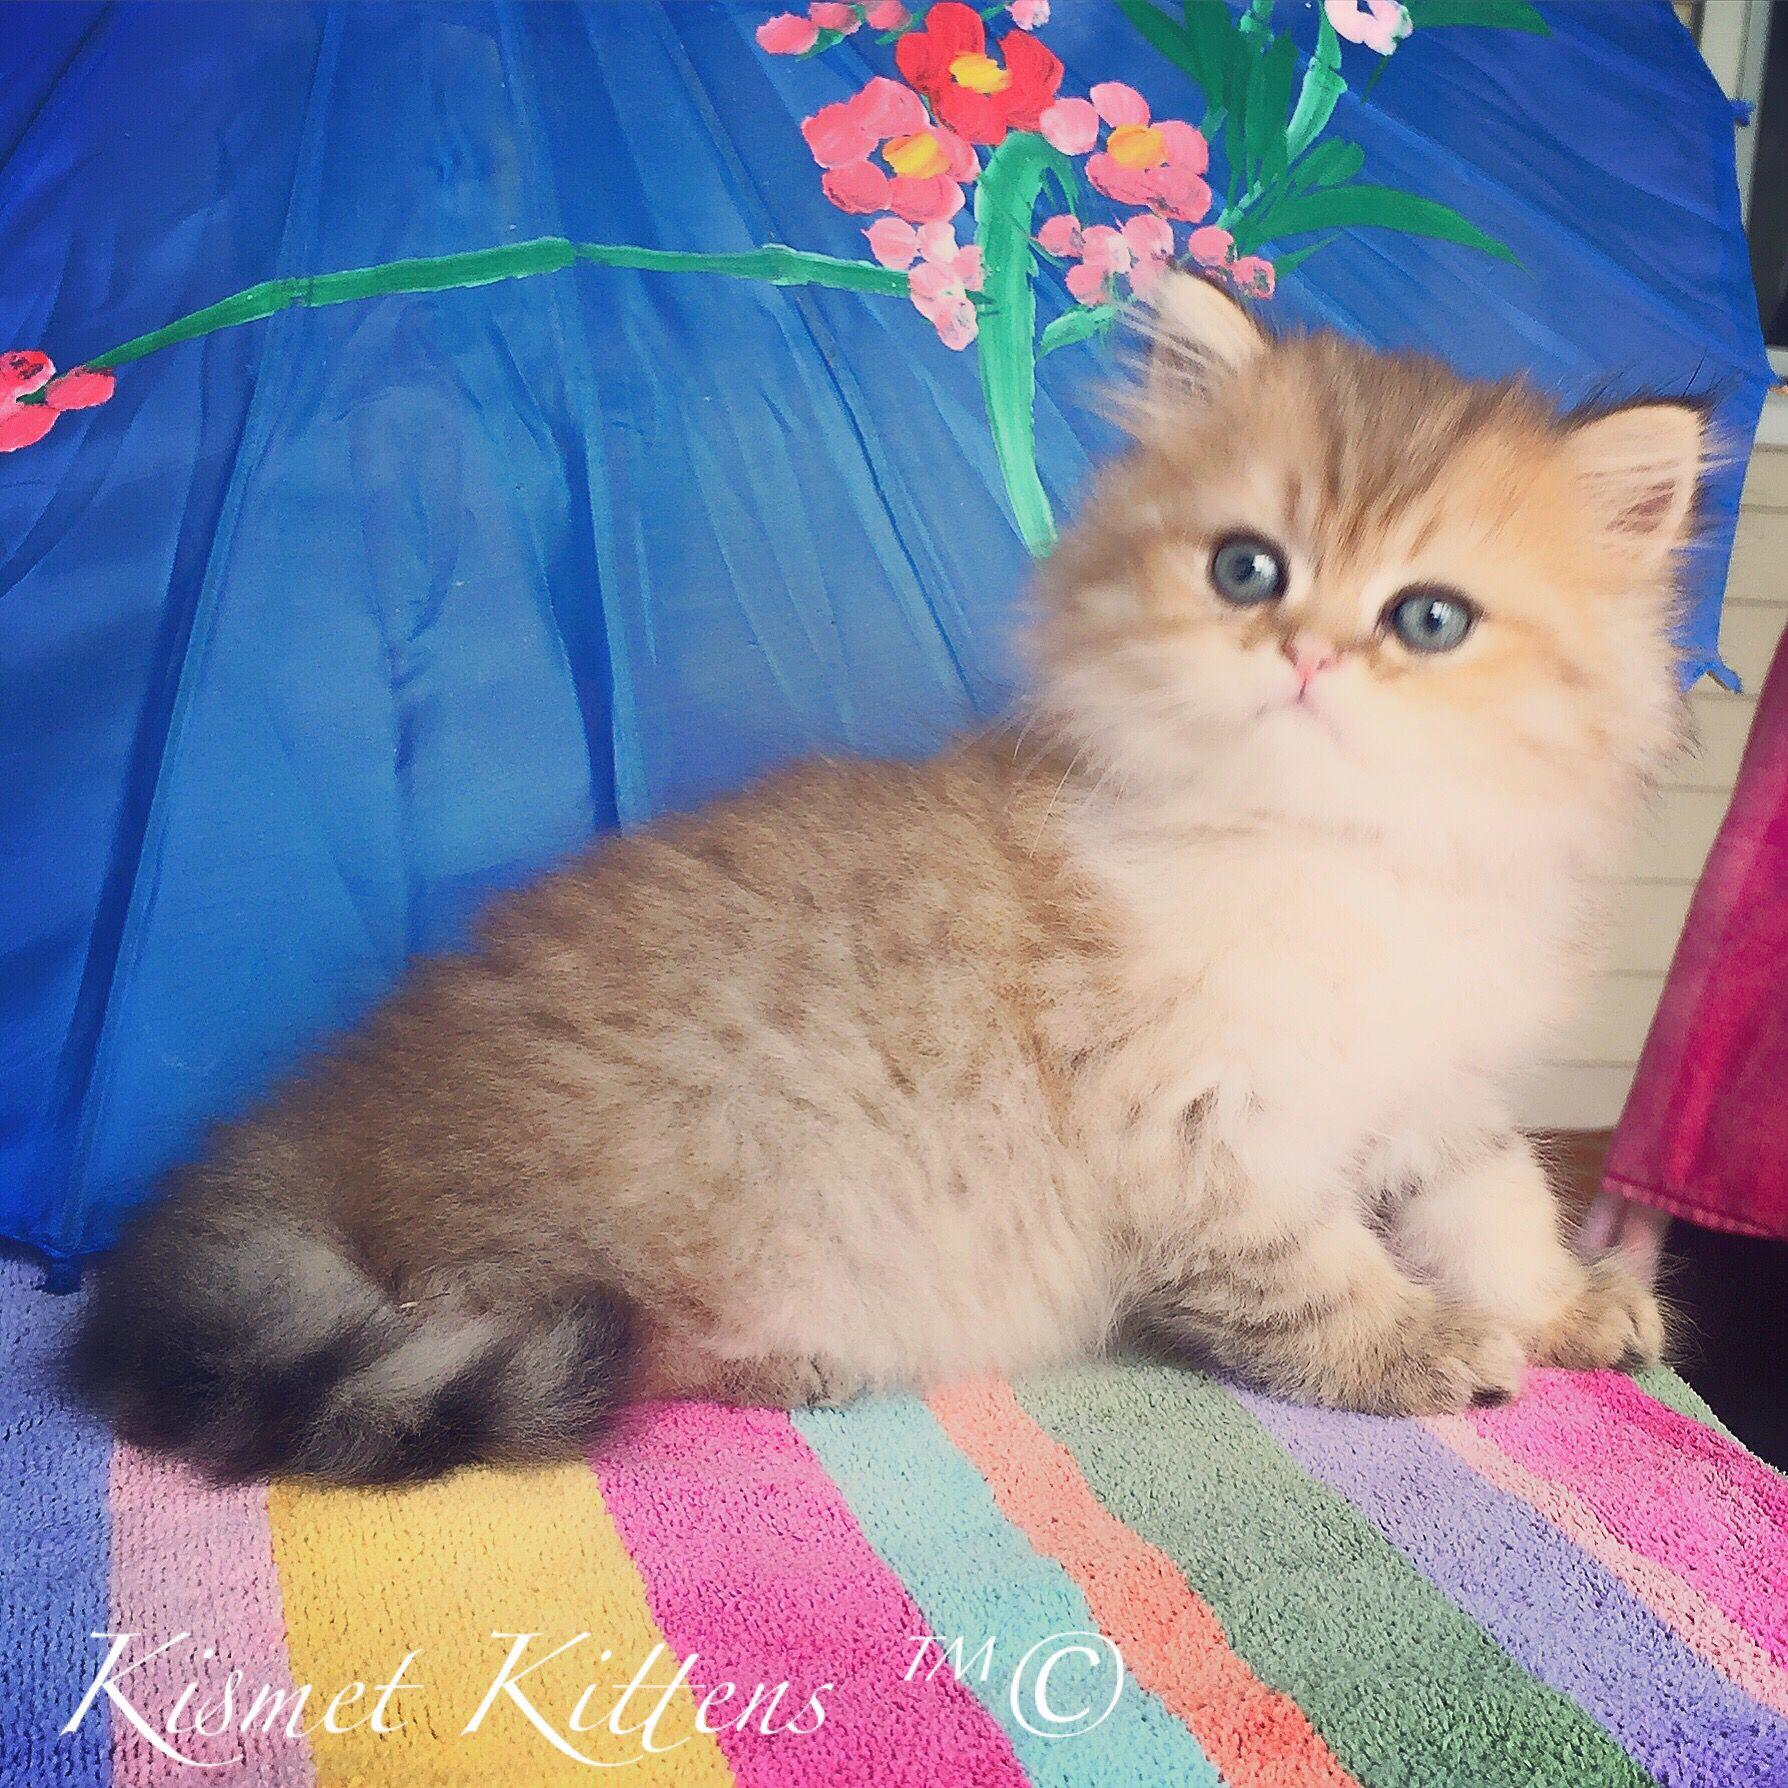 Kismet Kittens For Golden Chinchilla Shaded Doll Face Persian Kitten With Green Eyes Male Ready Persian Cat Doll Face Persian Kittens Teacup Persian Kittens